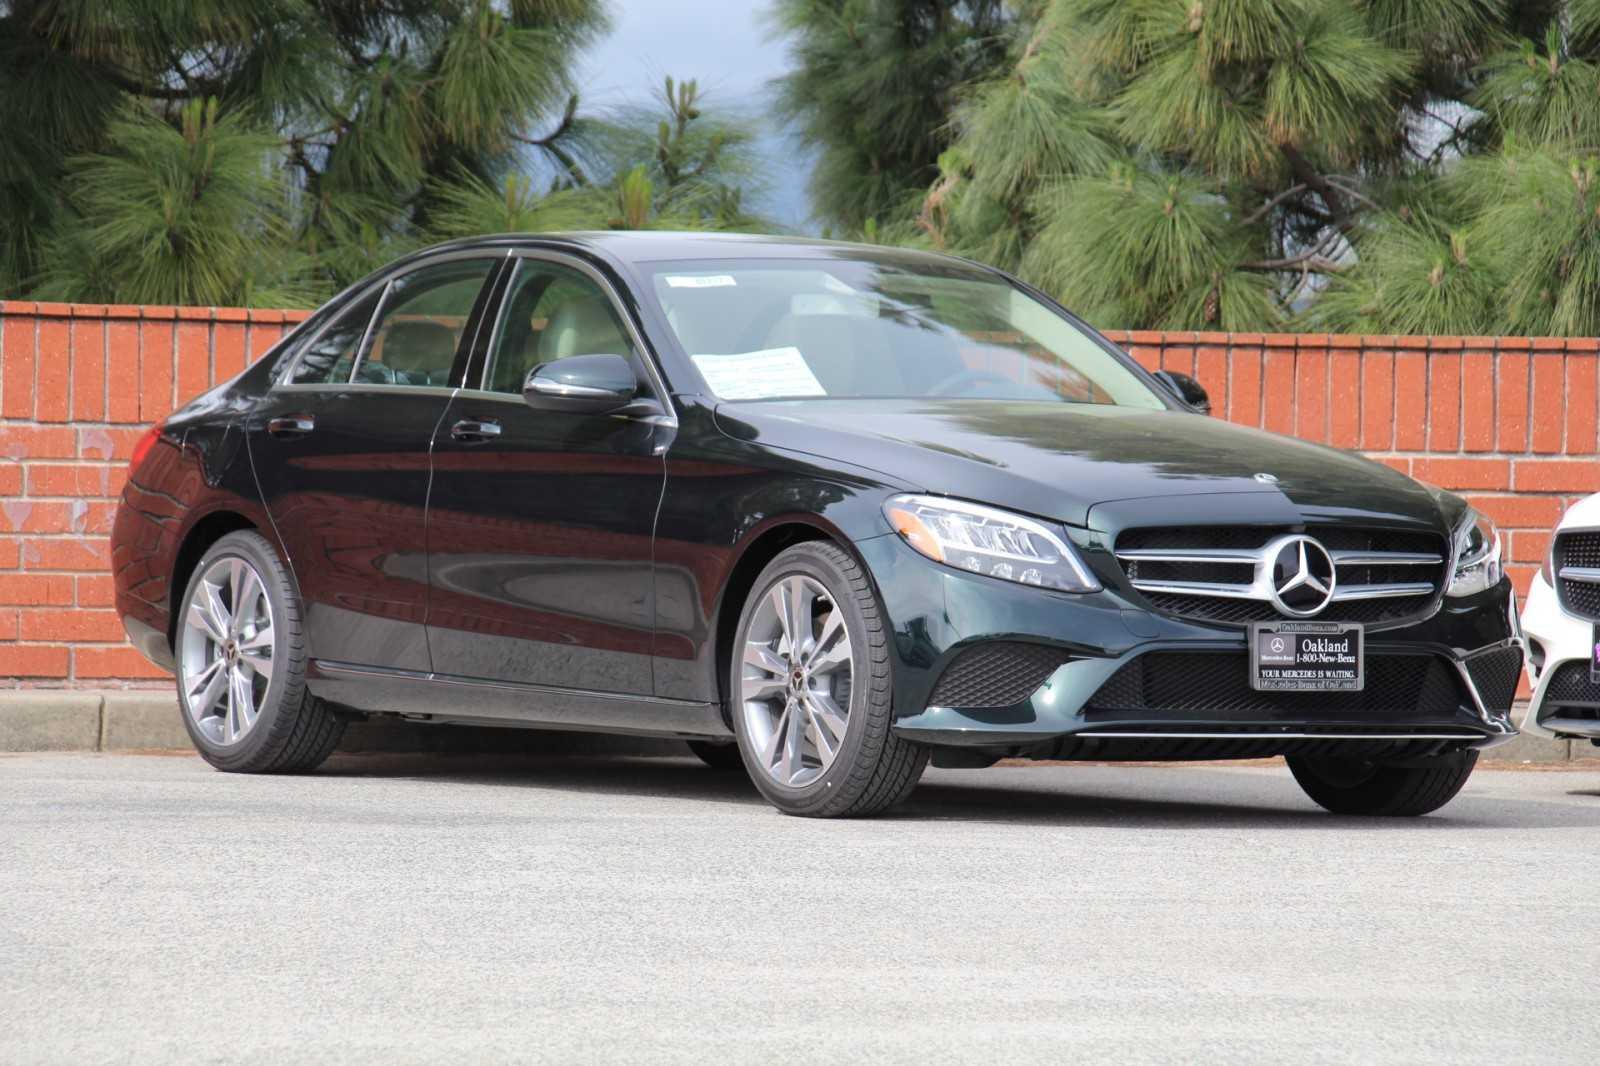 Mercedes C Class For Sale >> 2018 Mercedes Benz C Class C 300